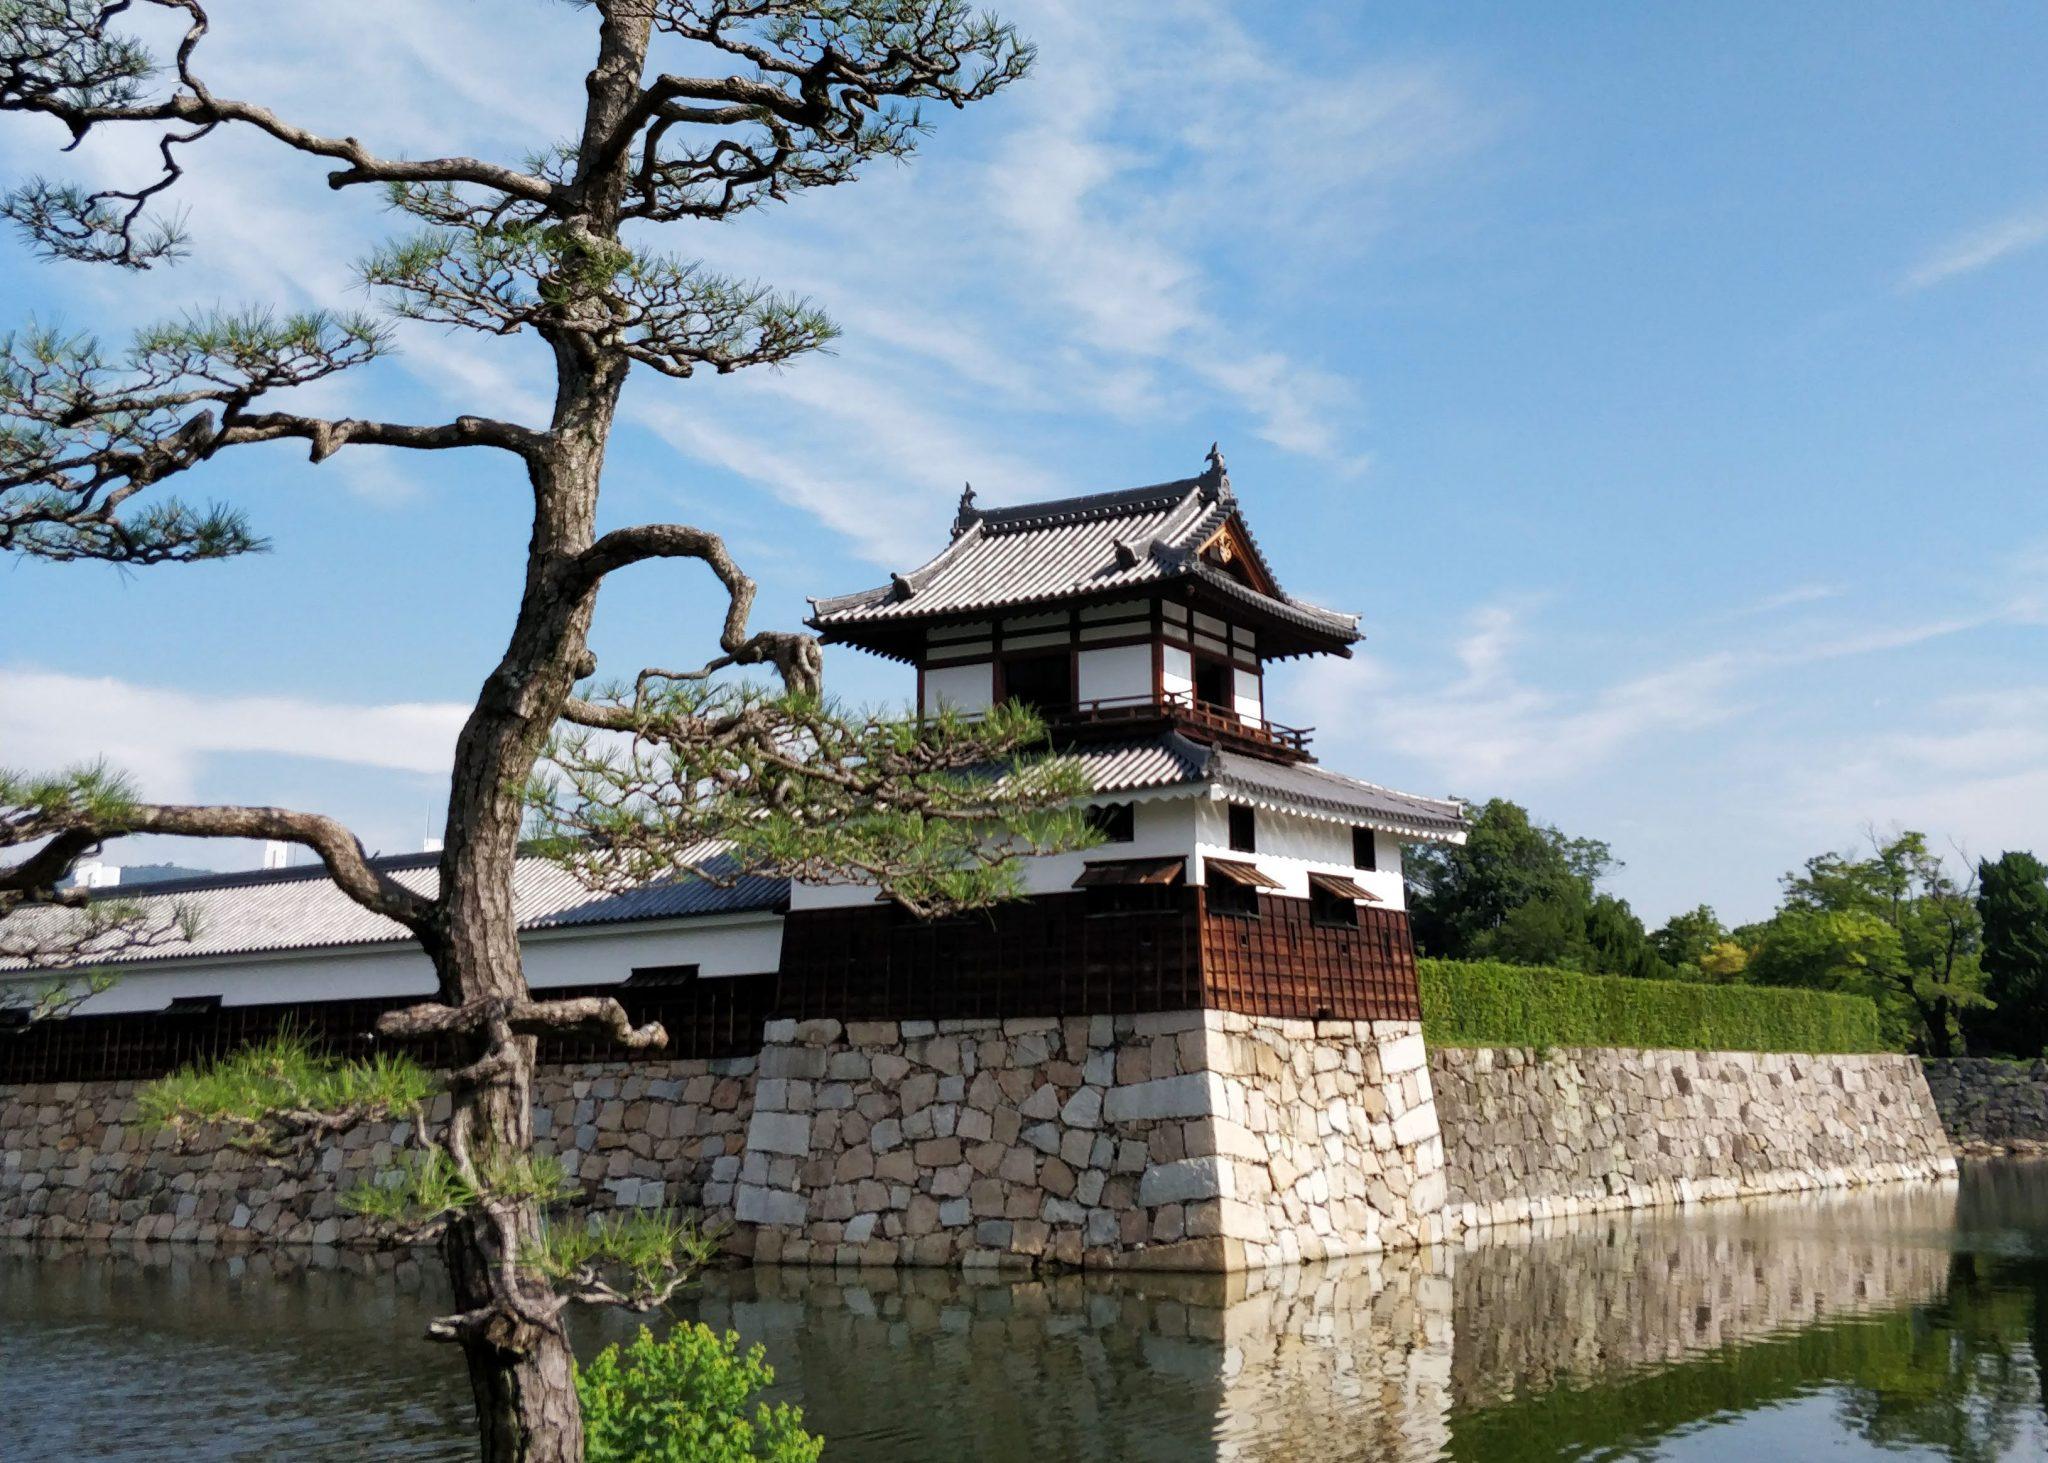 Hiroshiman linnan vallihaudat ja vartiotorni sekä mänty